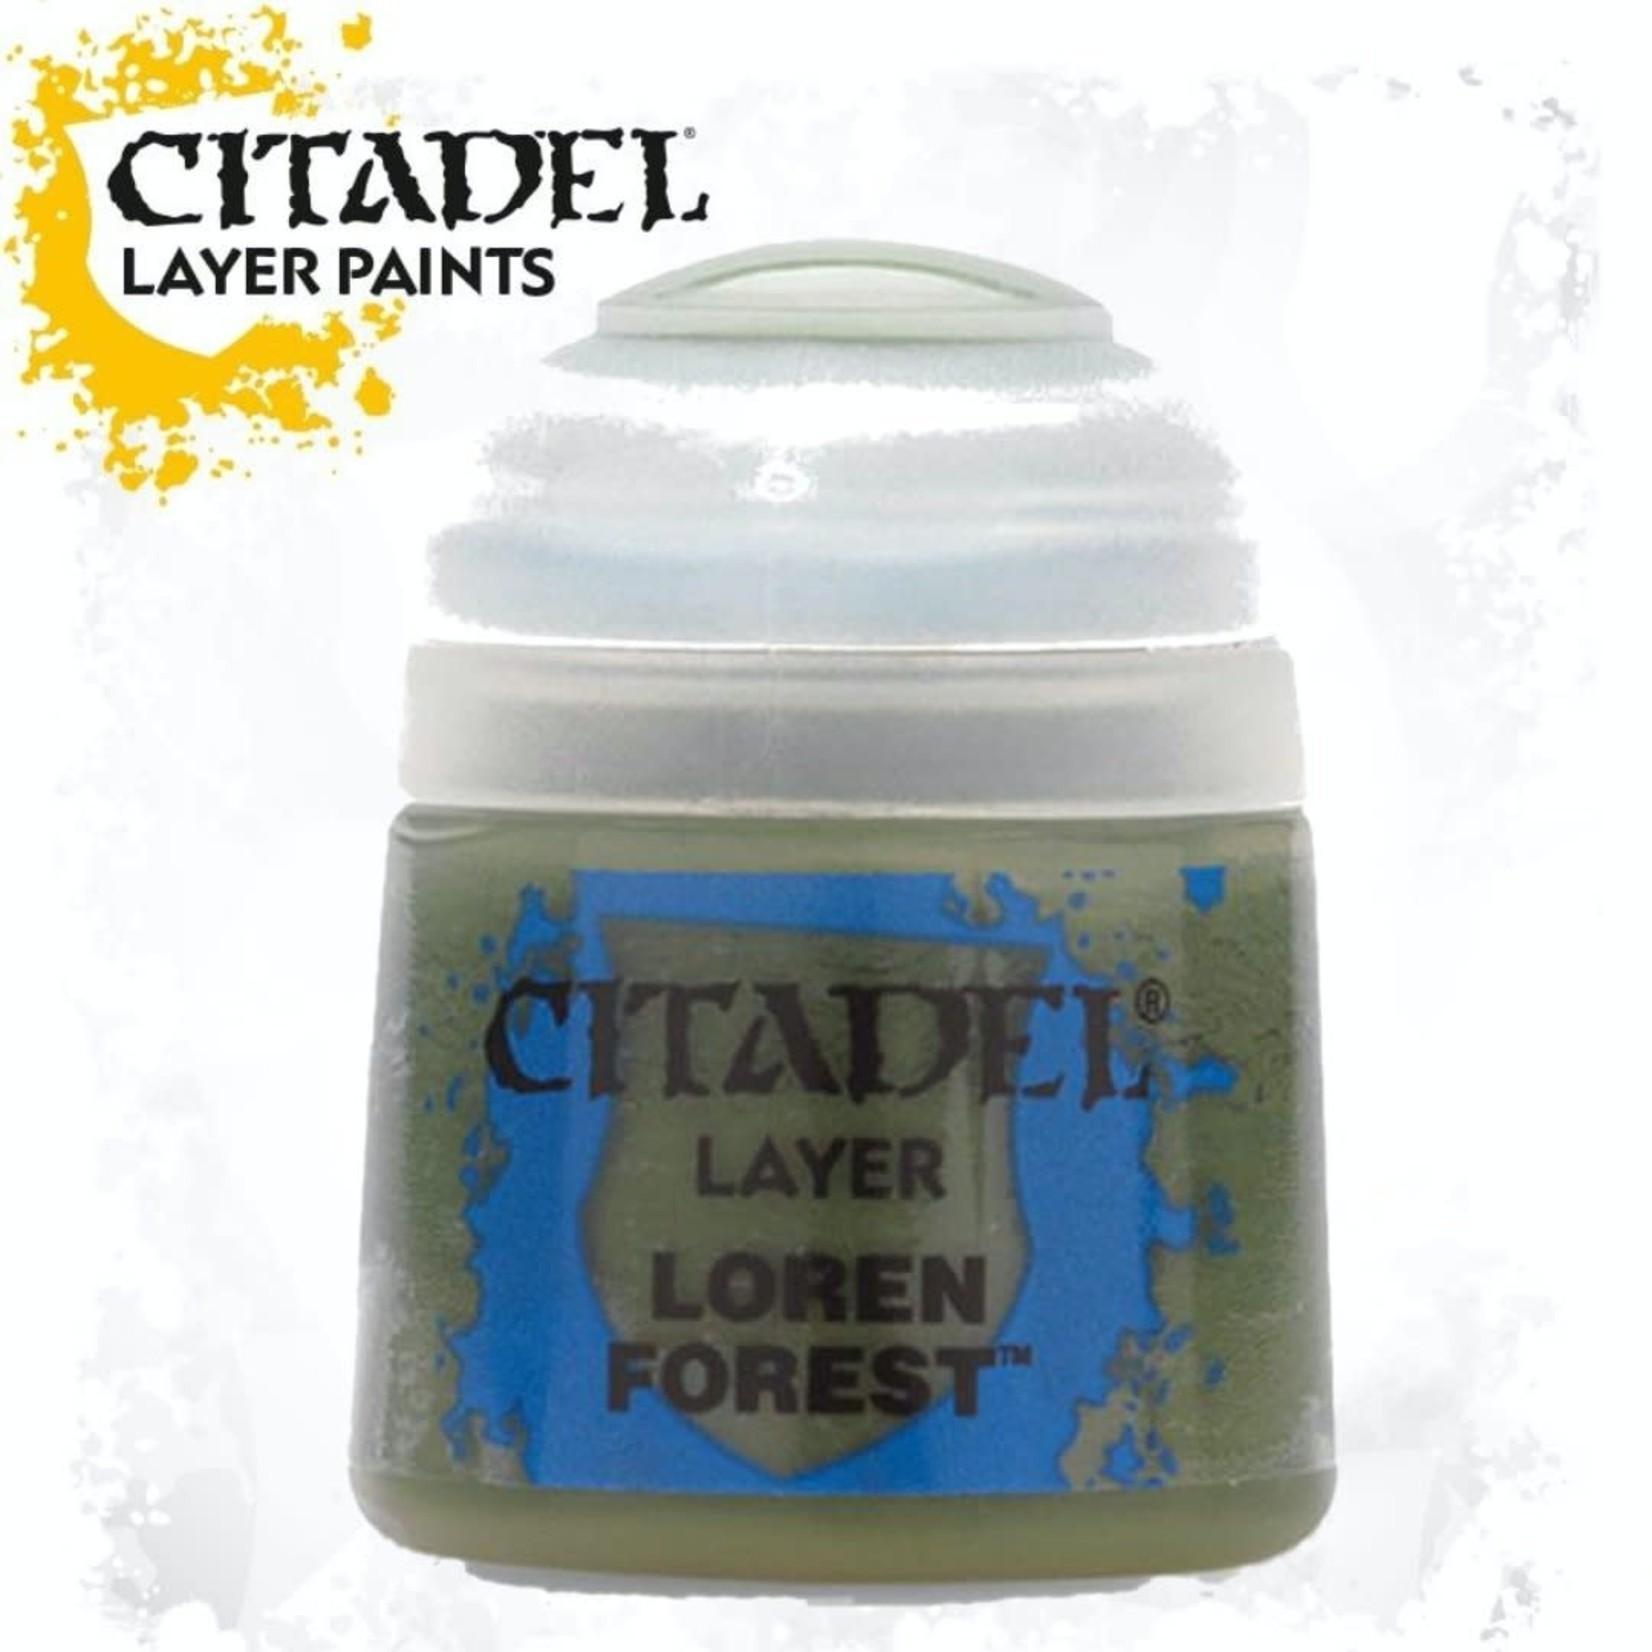 Citadel Citadel Paint - Layer: Loren Forest